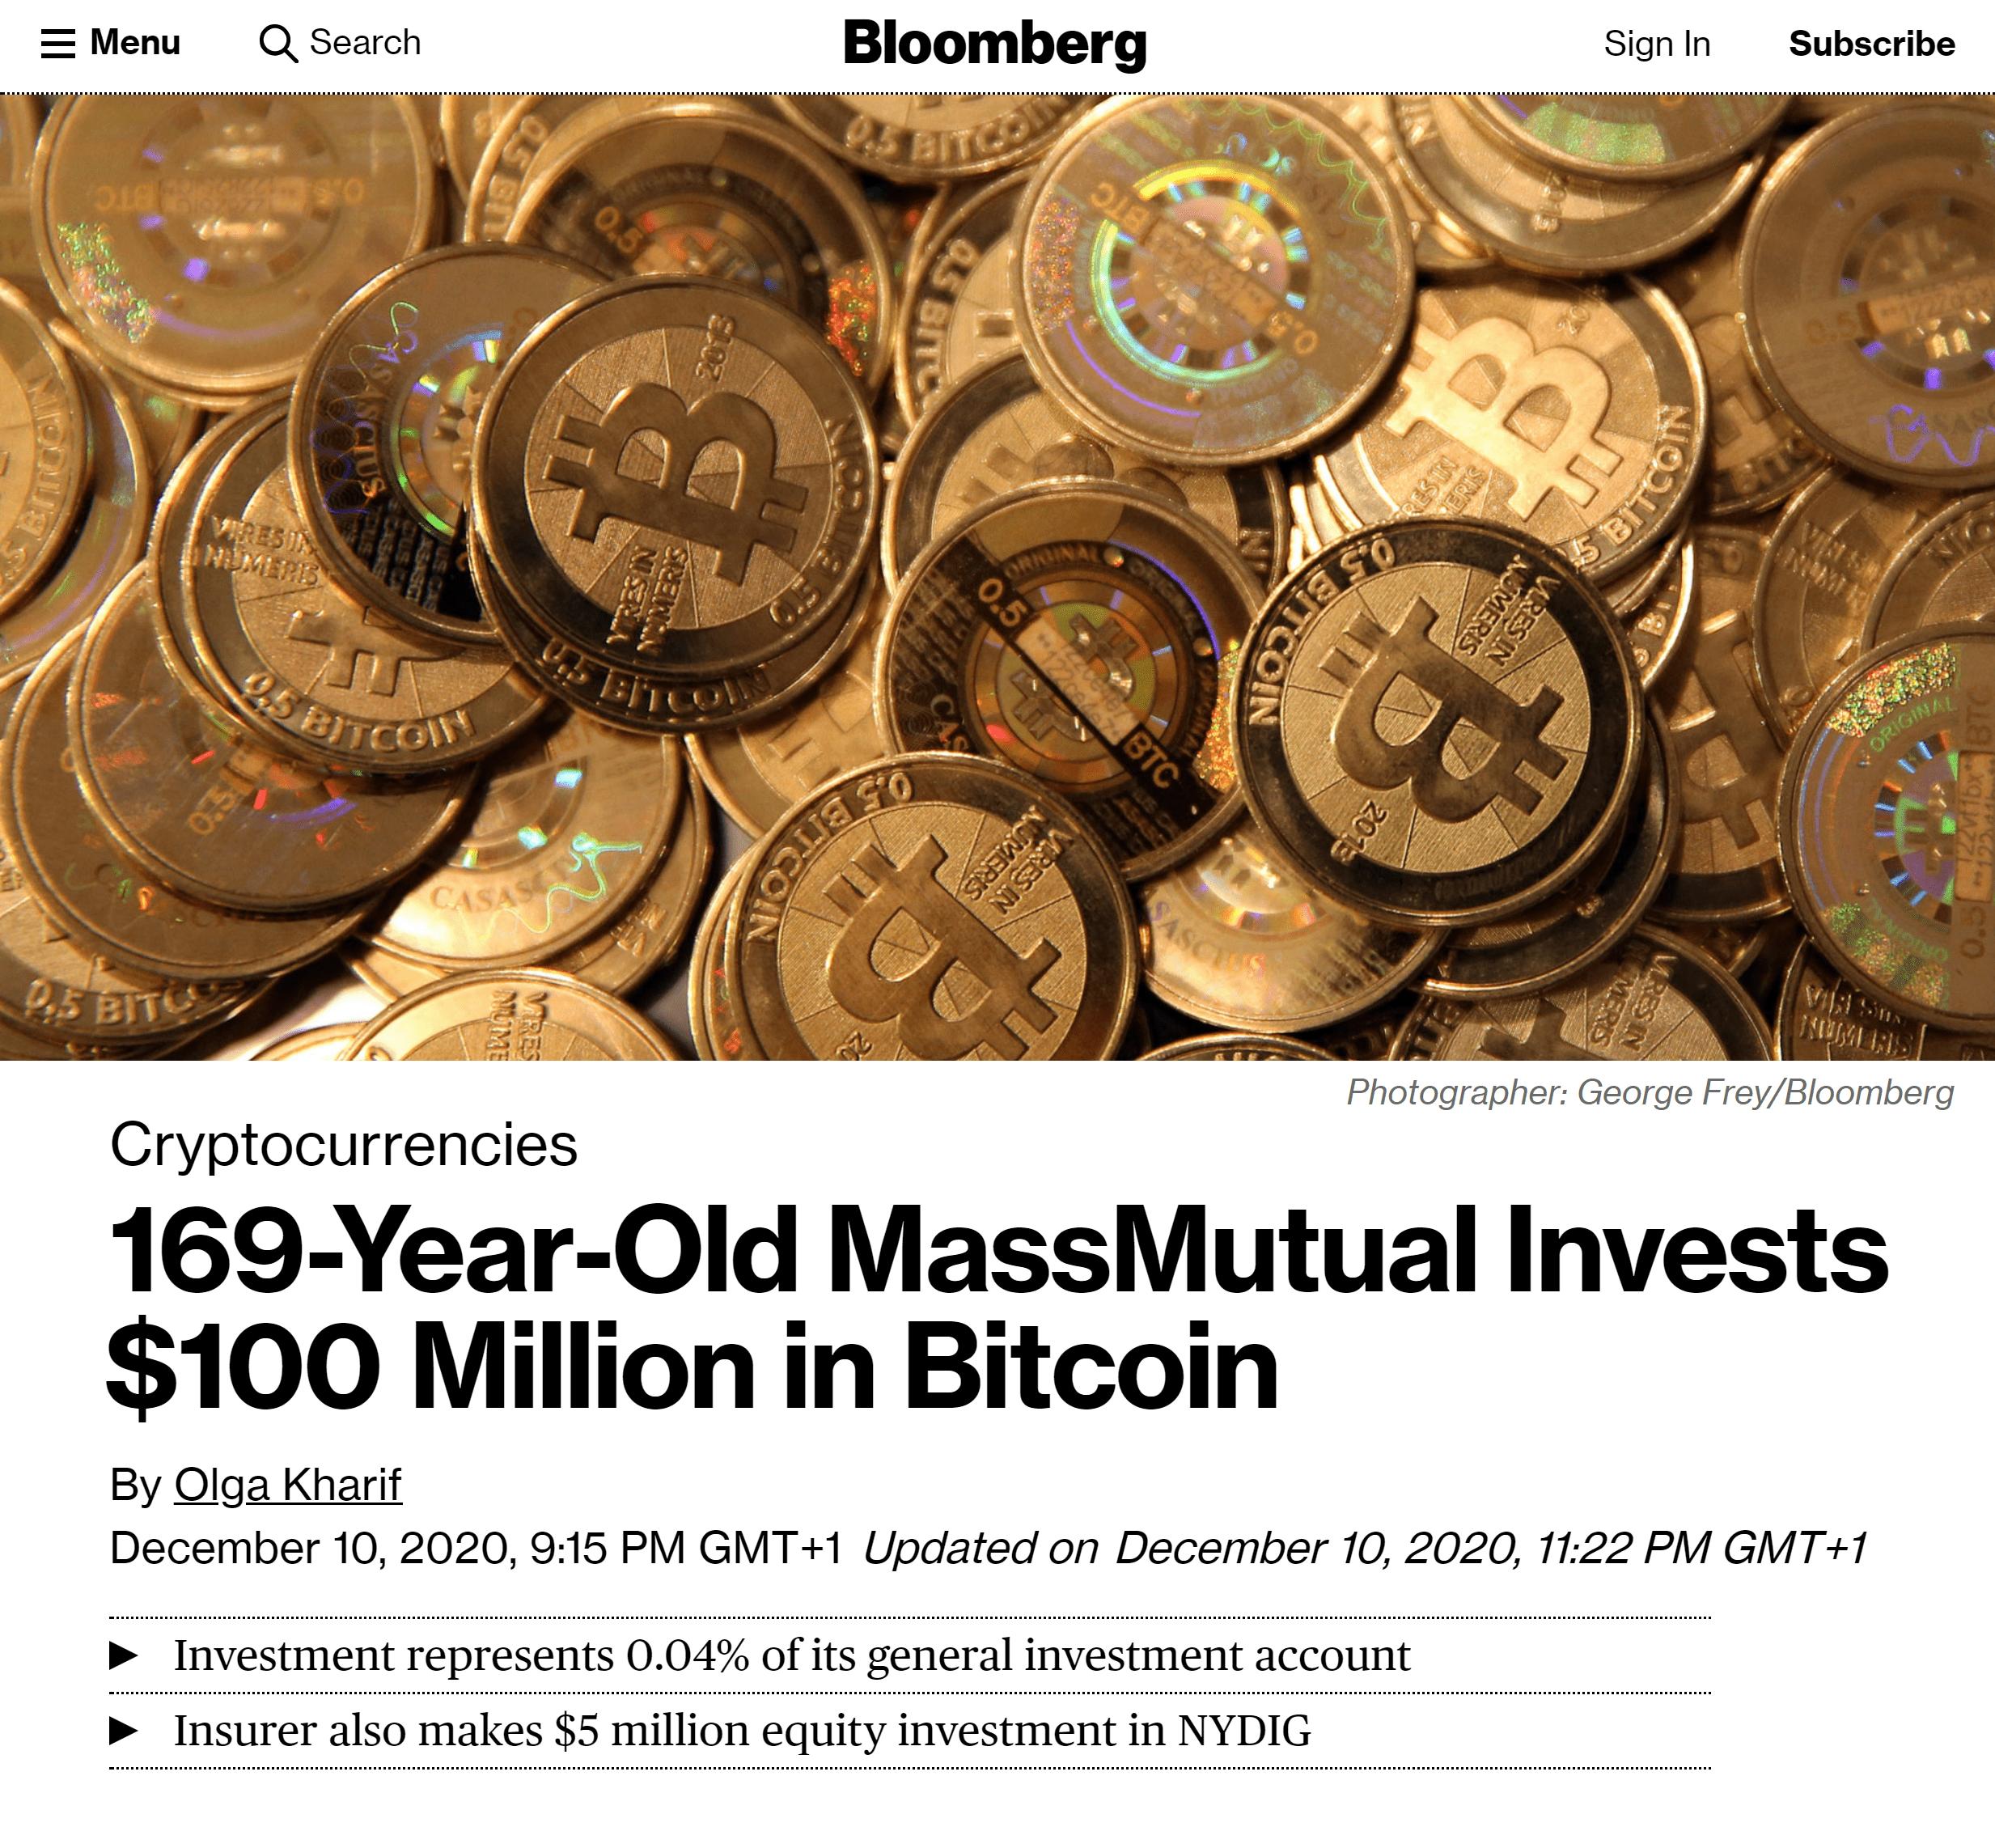 massmutual-invests-100-million-in-bit...